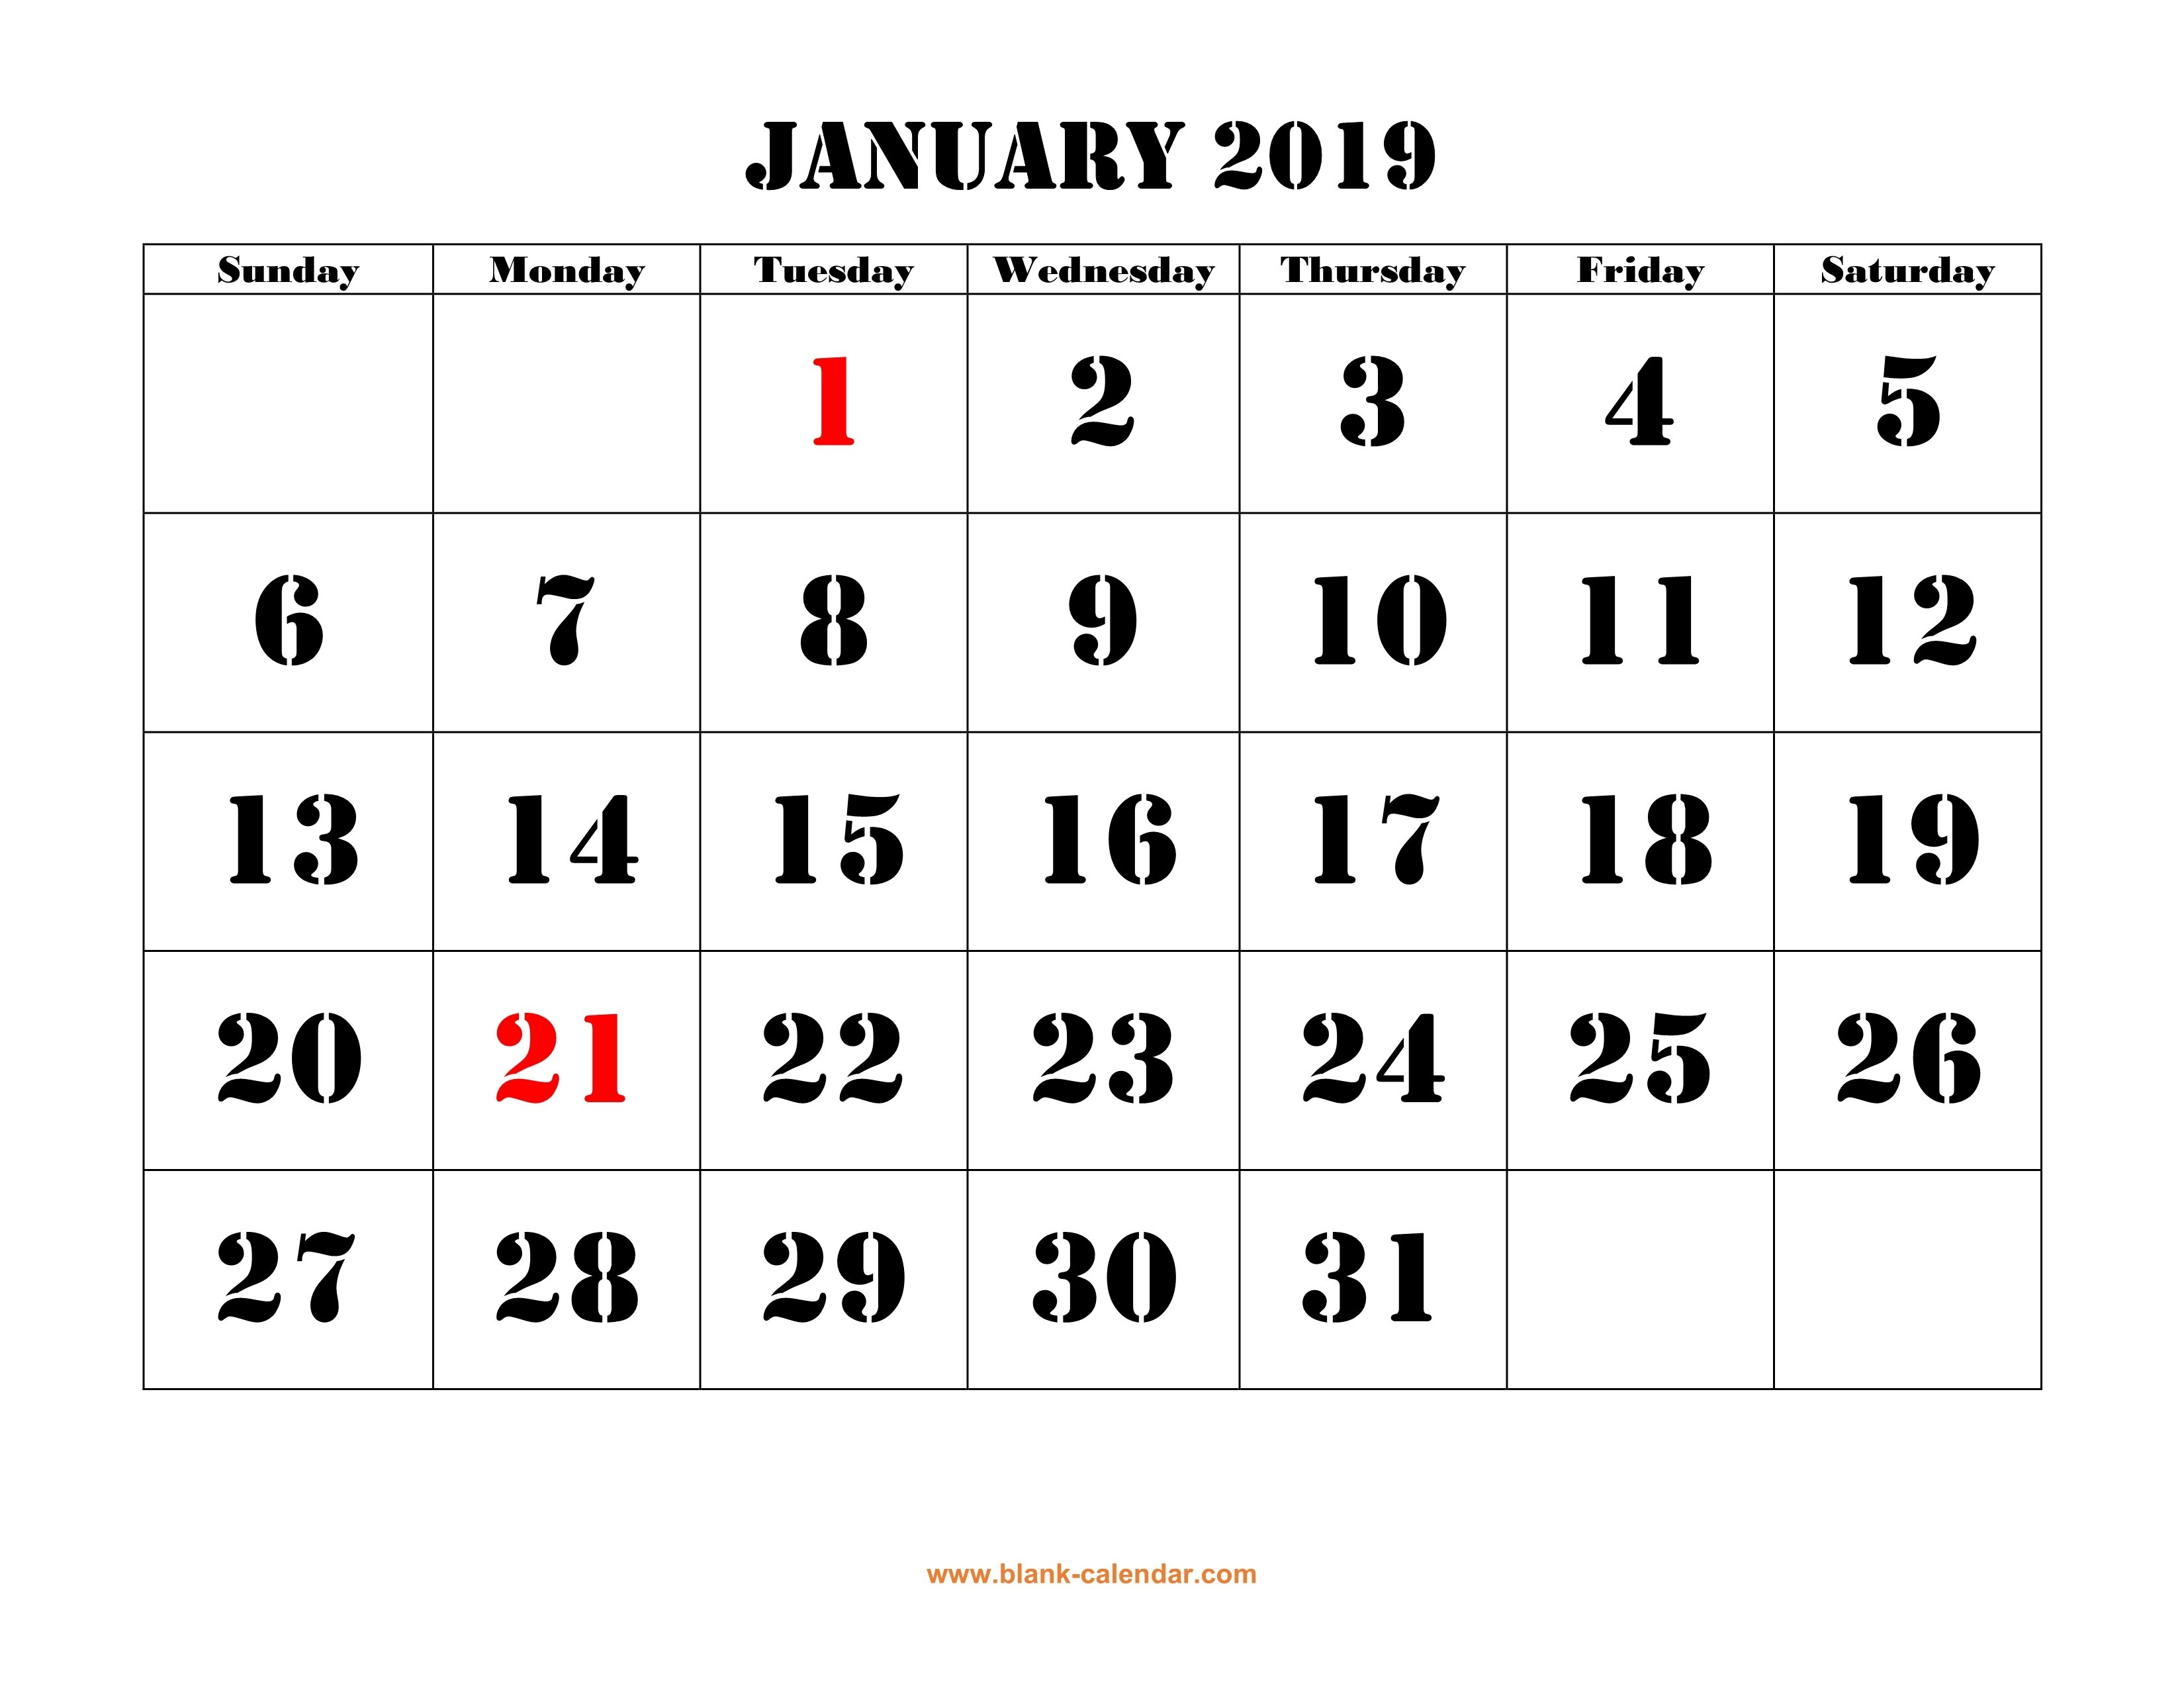 Free Download Printable January 2019 Calendar, Large Font Design January 5 2019 Calendar